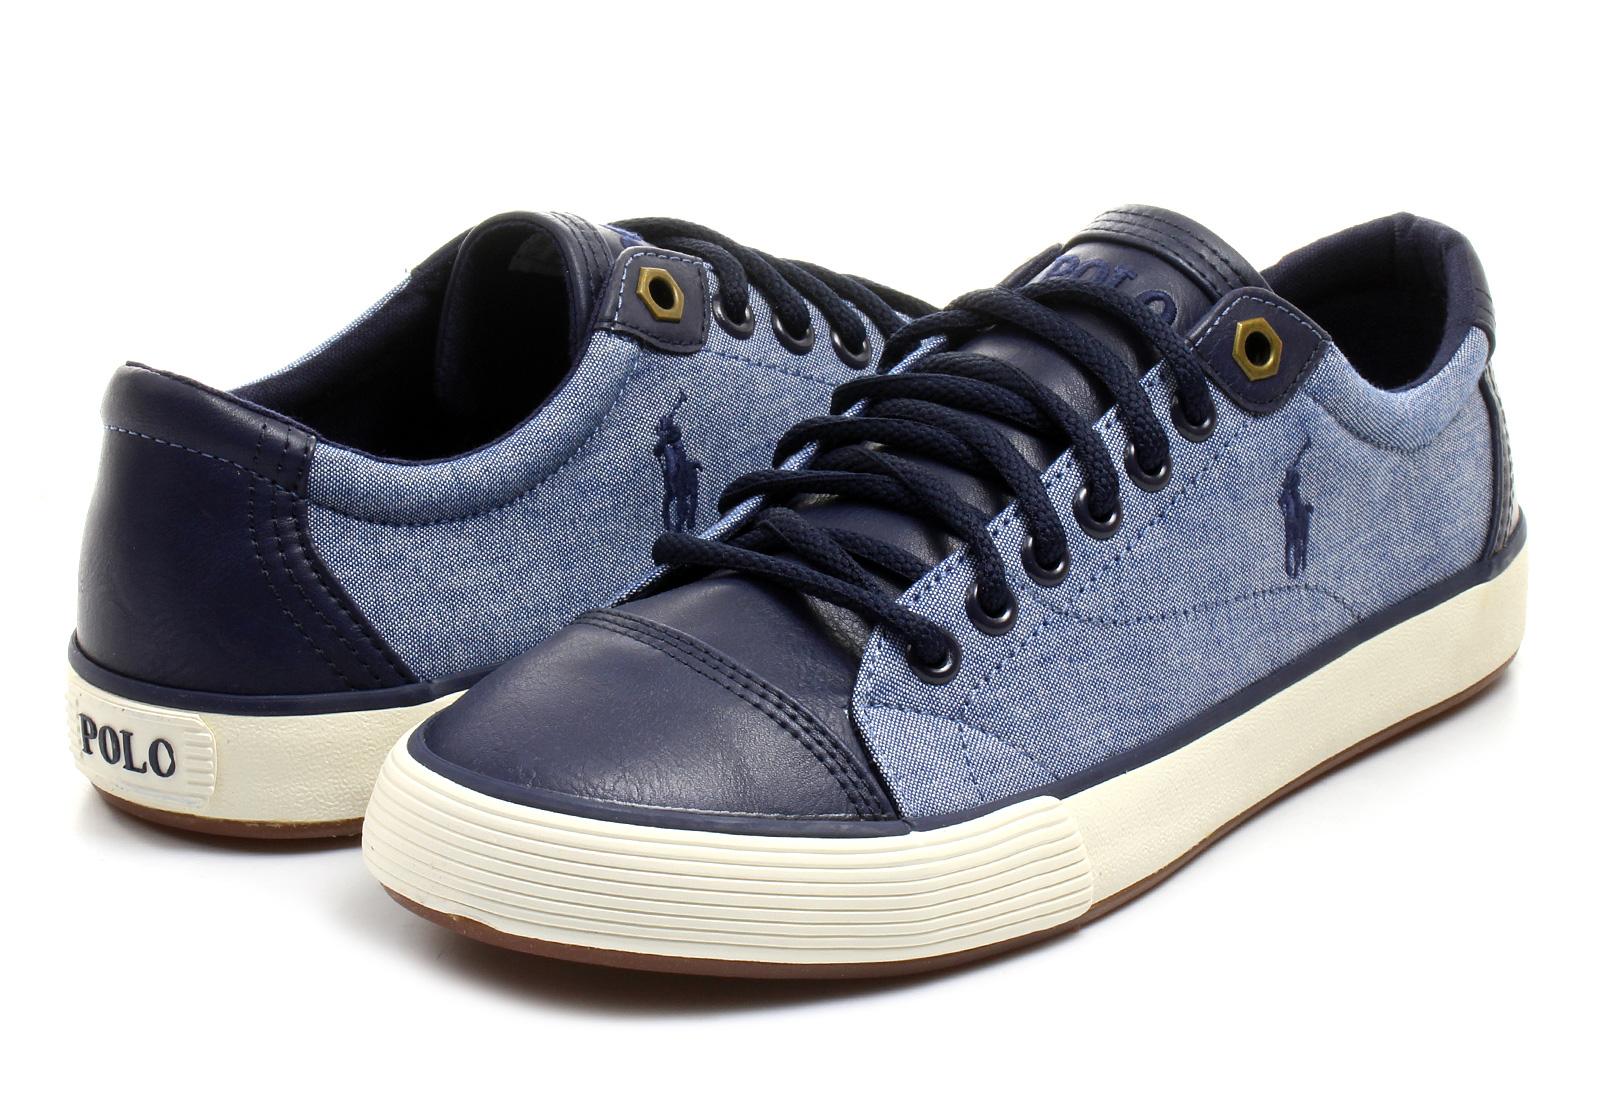 polo ralph lauren shoes klinger 2065 c a4001 online shop for sneakers shoes and boots. Black Bedroom Furniture Sets. Home Design Ideas